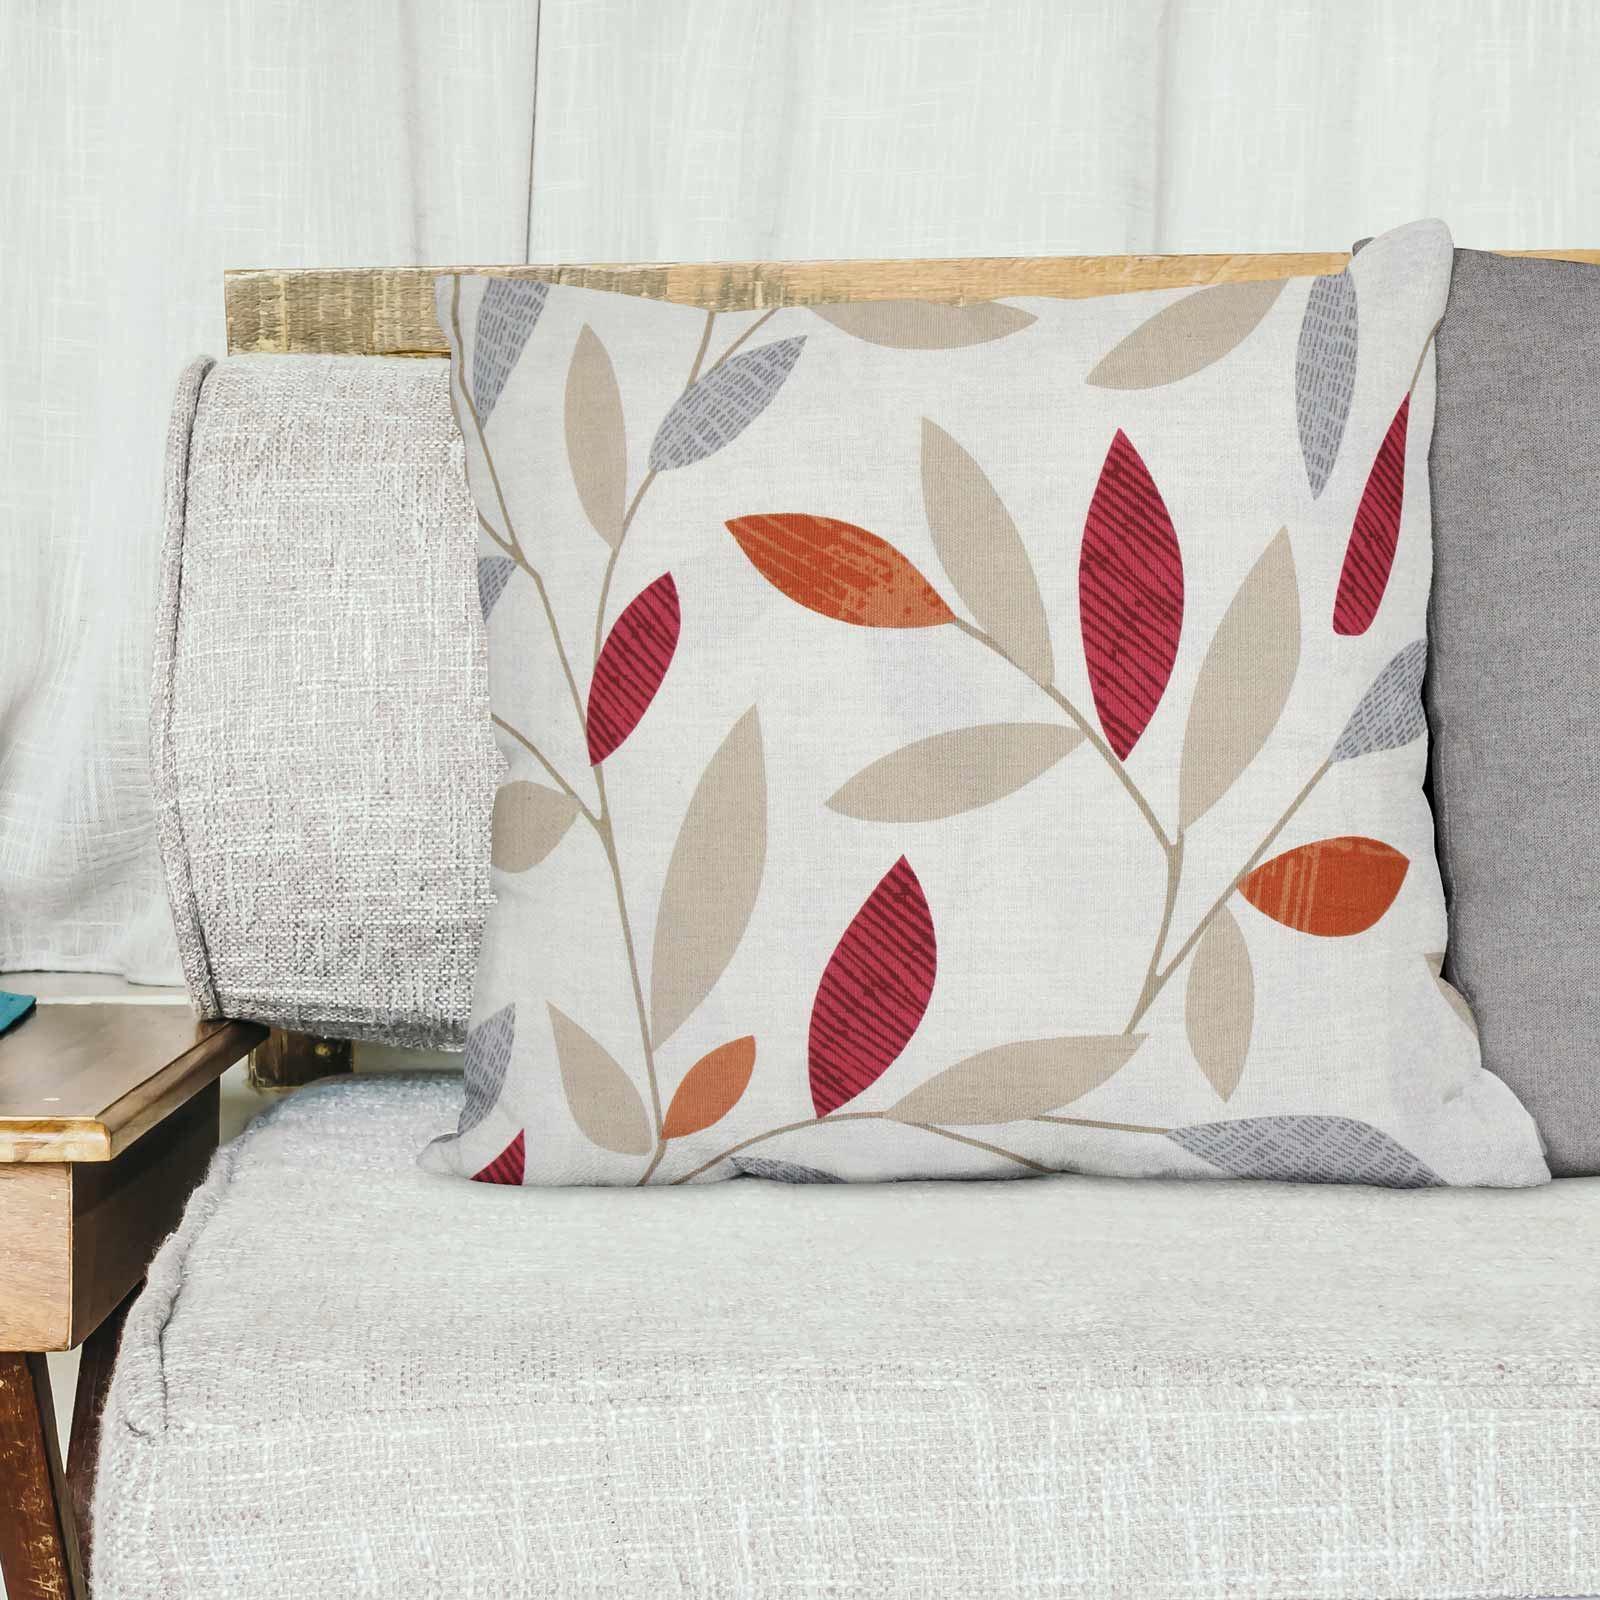 Vino-Tinto-Cushion-Covers-Coleccion-17-034-18-034-43cm-45cm-Cubierta miniatura 48